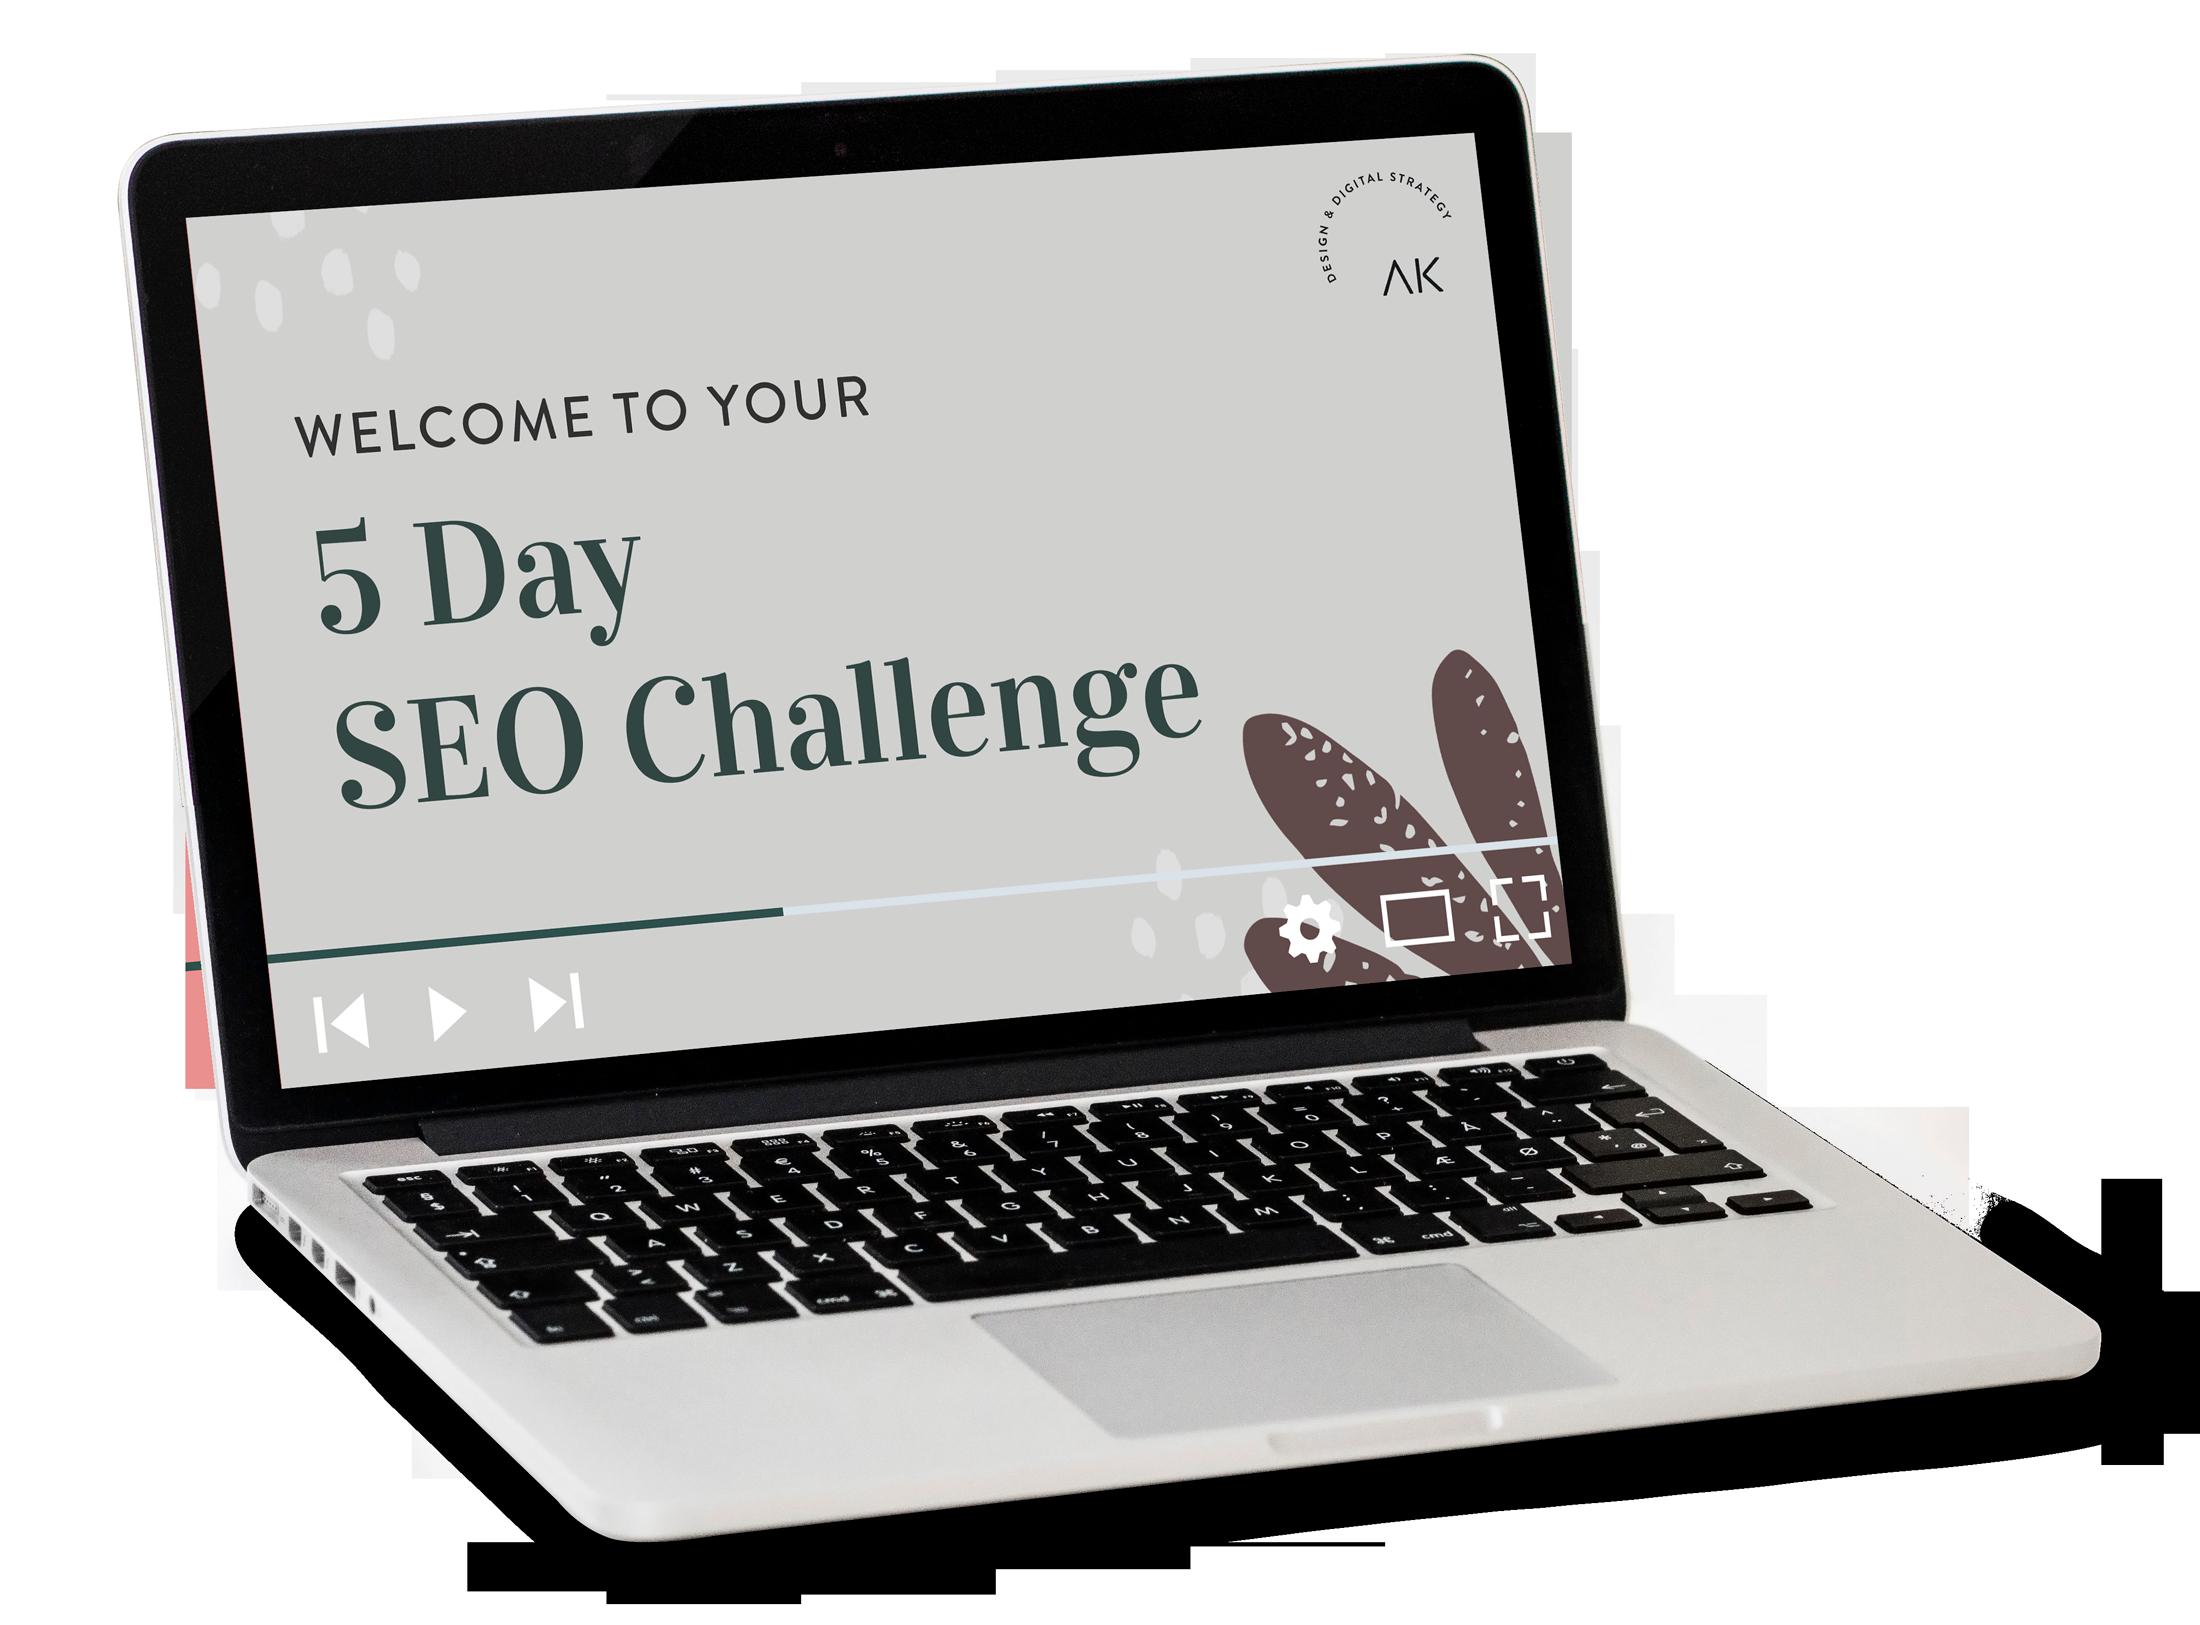 5 Day SEO Challenge